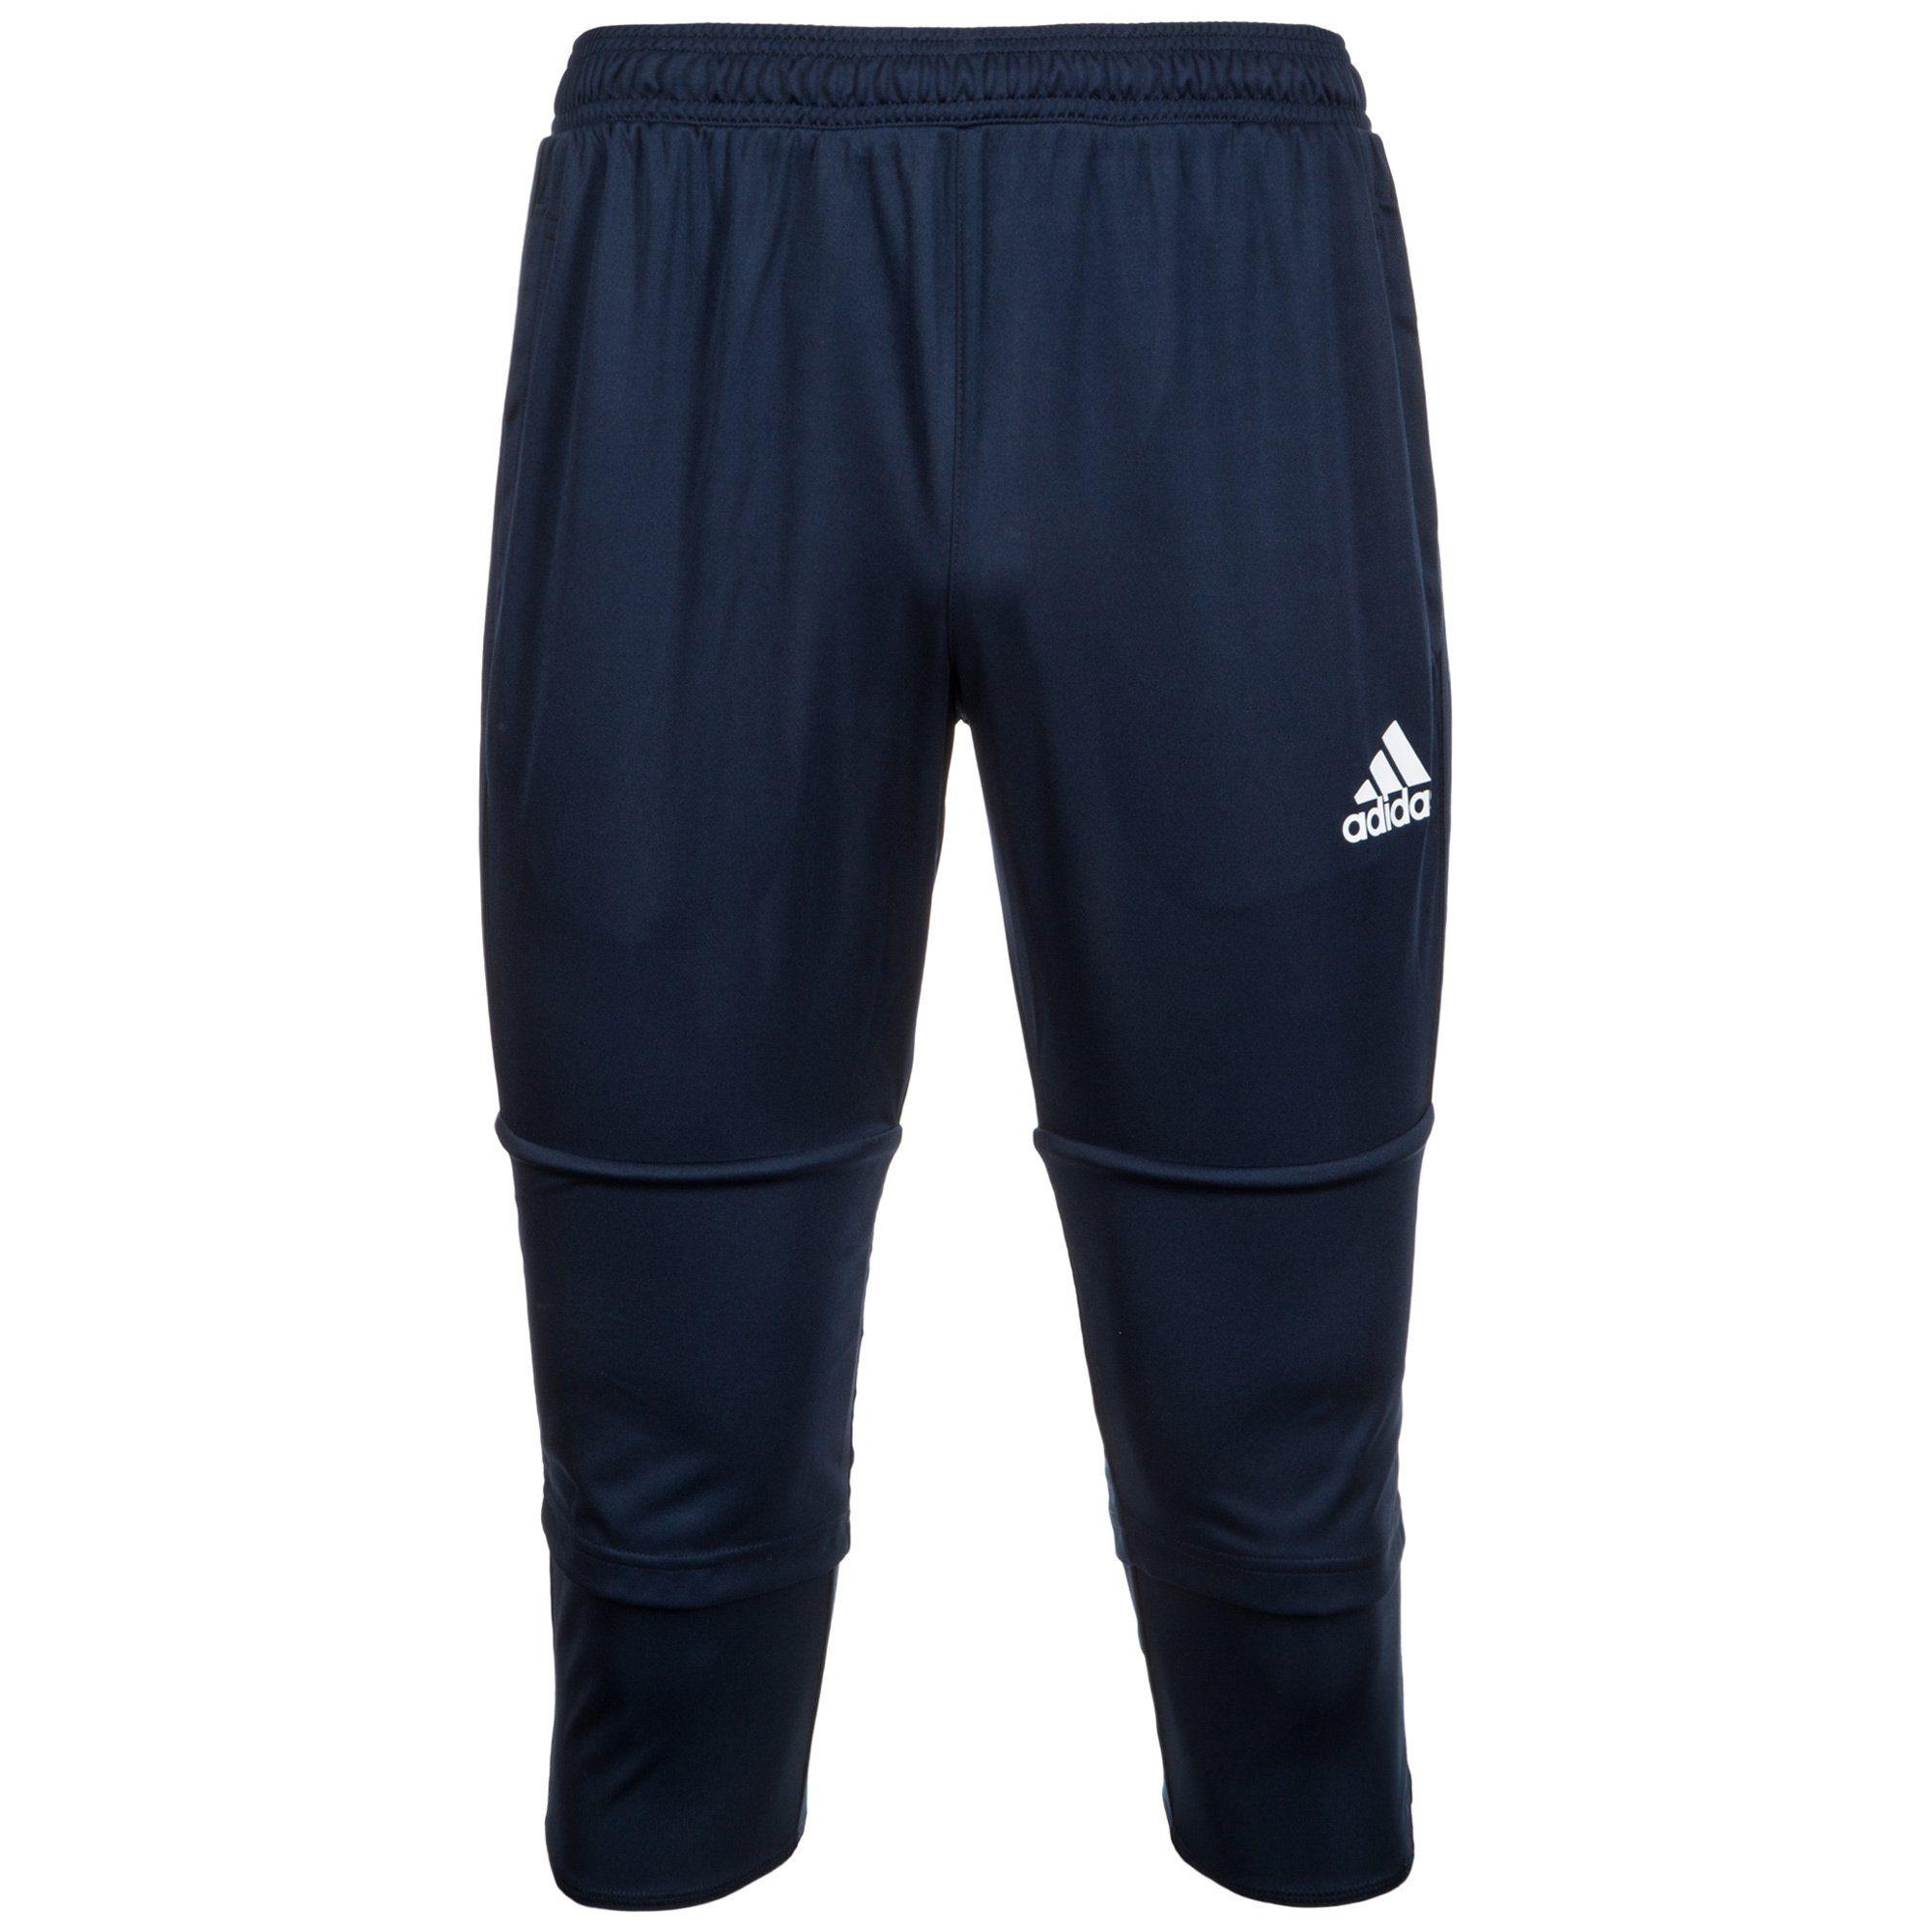 606c6737de85aa Sonstige Sporthosen für Herren online kaufen